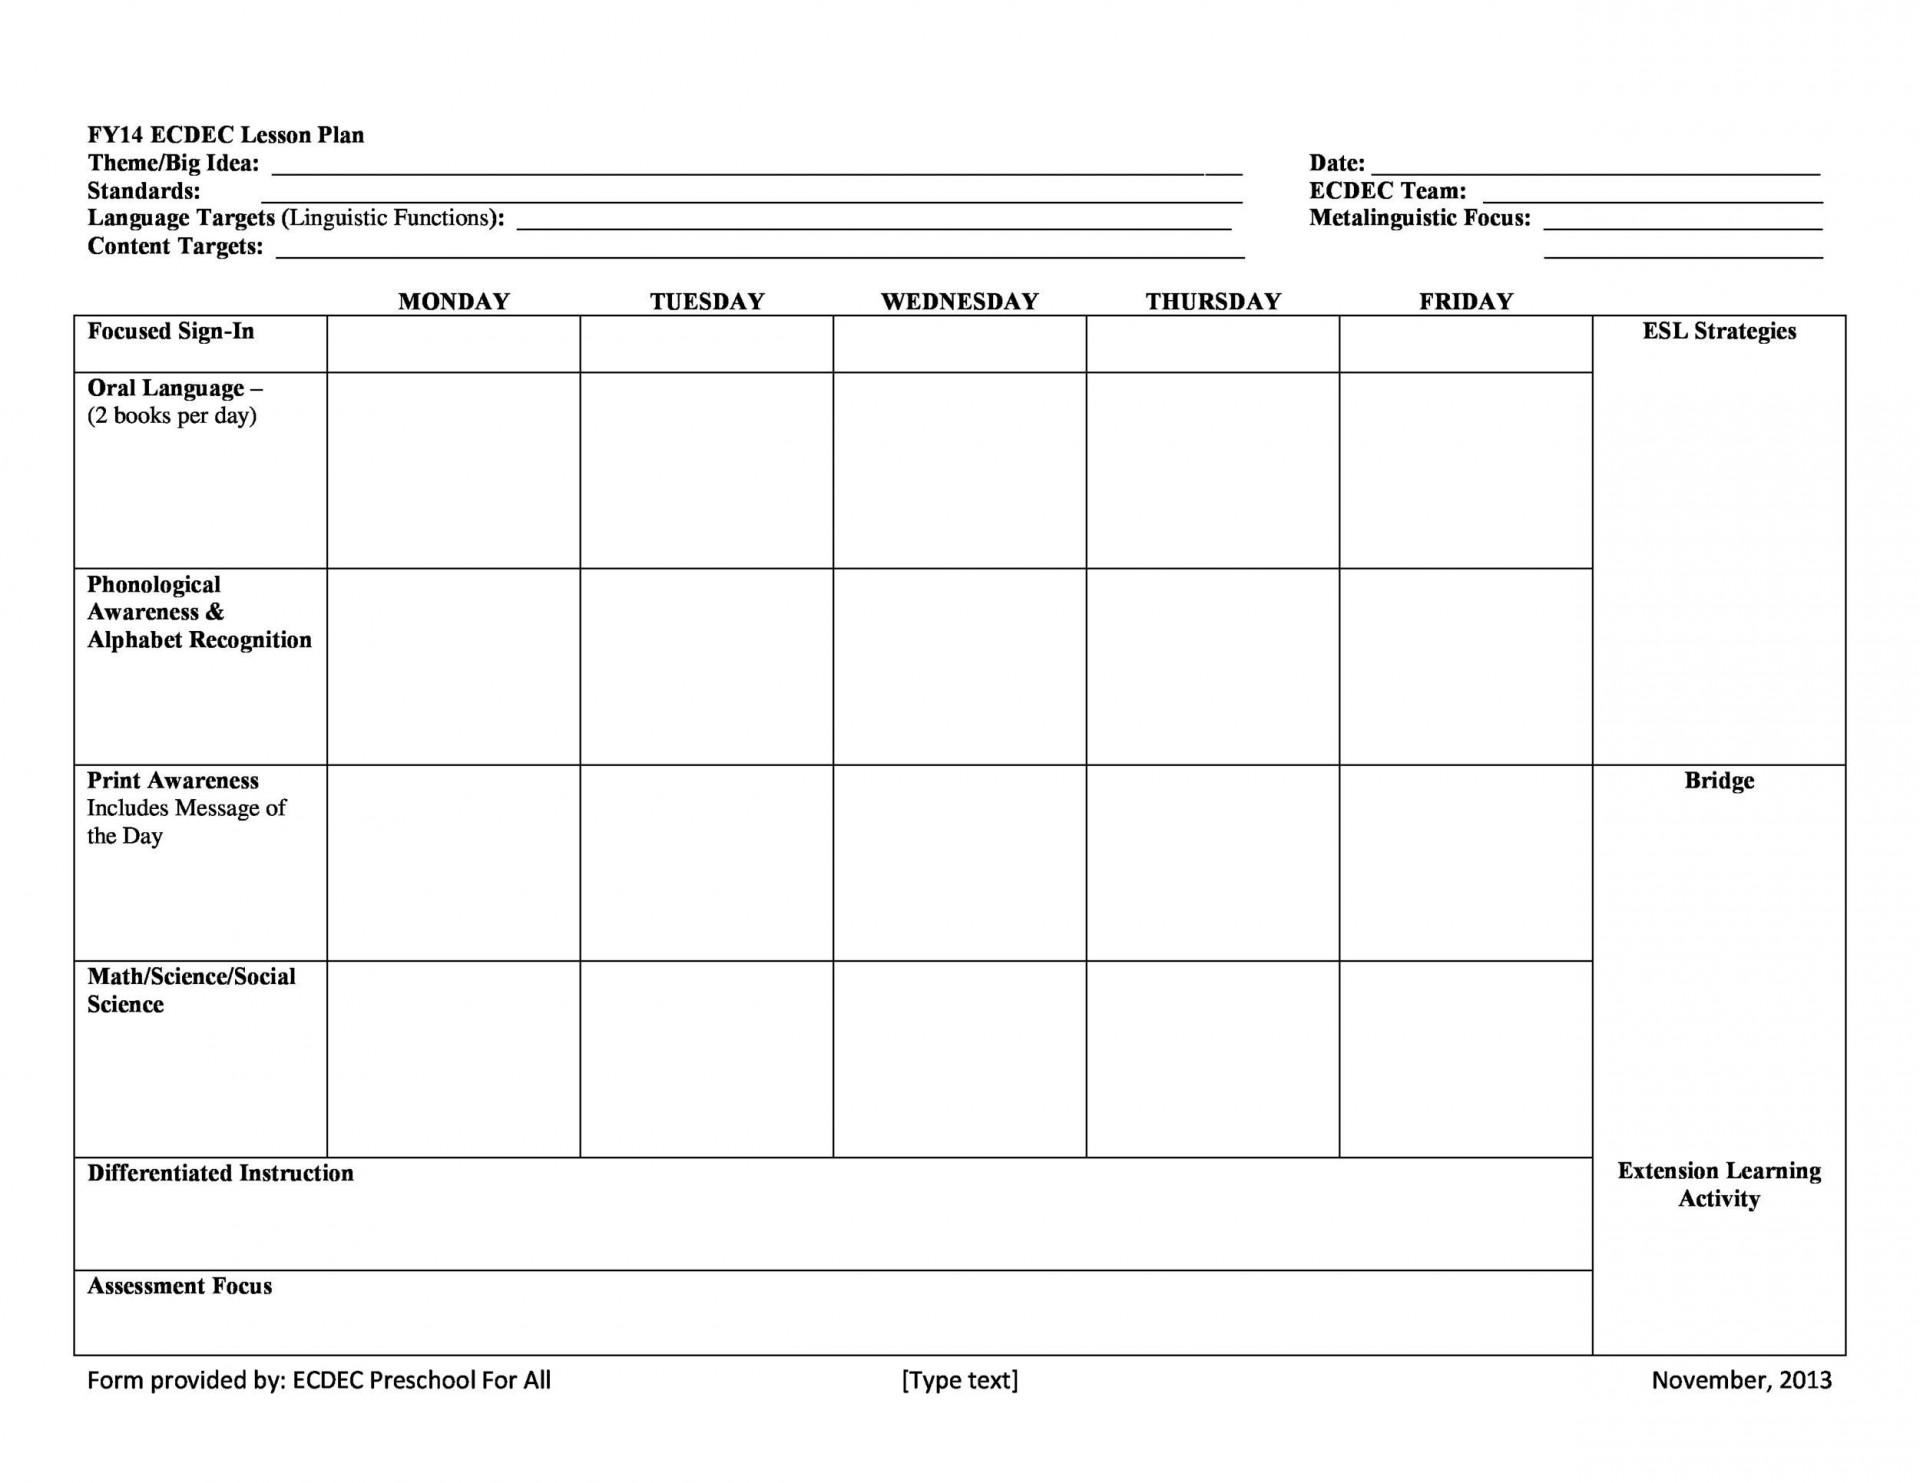 005 Impressive Free Printable Lesson Plan Template Example  Preschool Weekly For Kindergarten1920